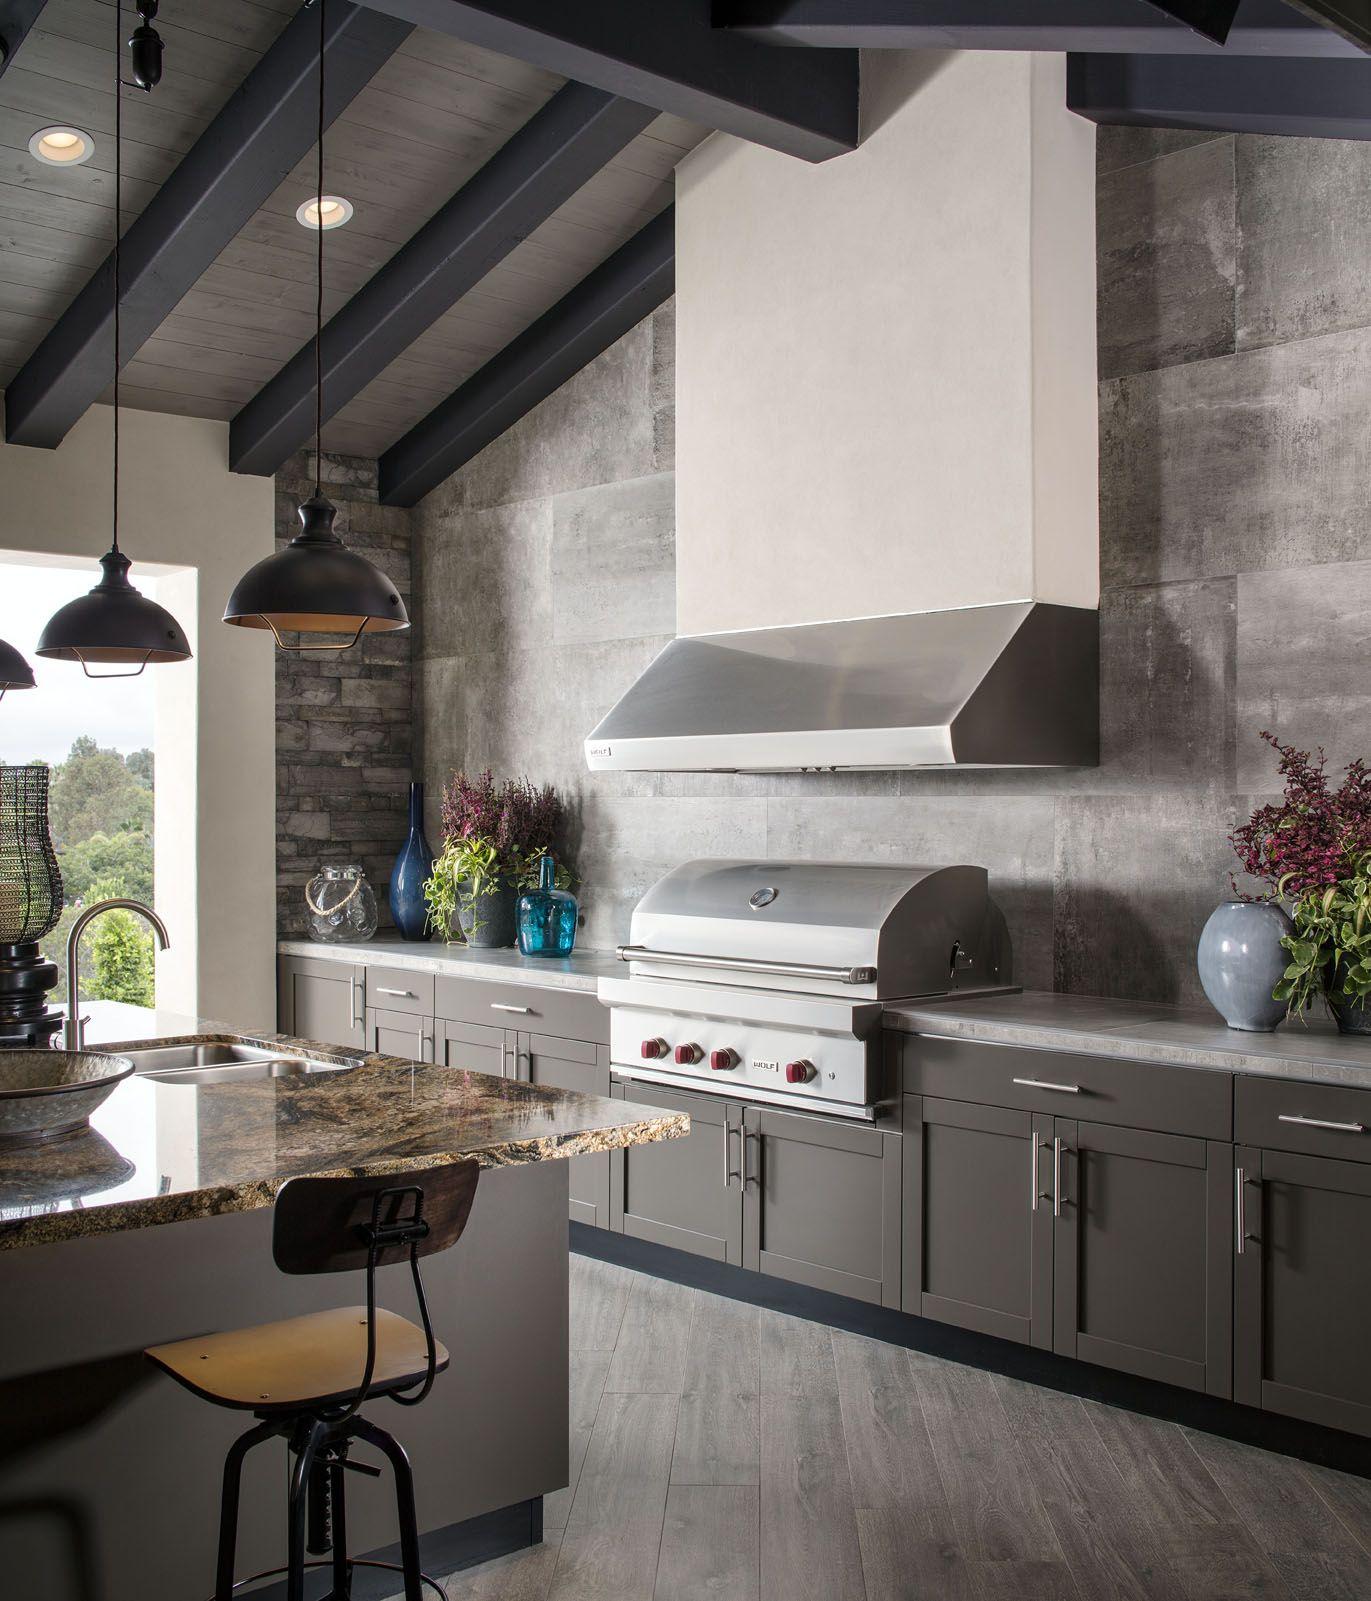 8 Outdoor Kitchen Designs Ideas Plans Outdoor Kitchen Outdoor Kitchen Design Outdoor Kitchen Design Layout